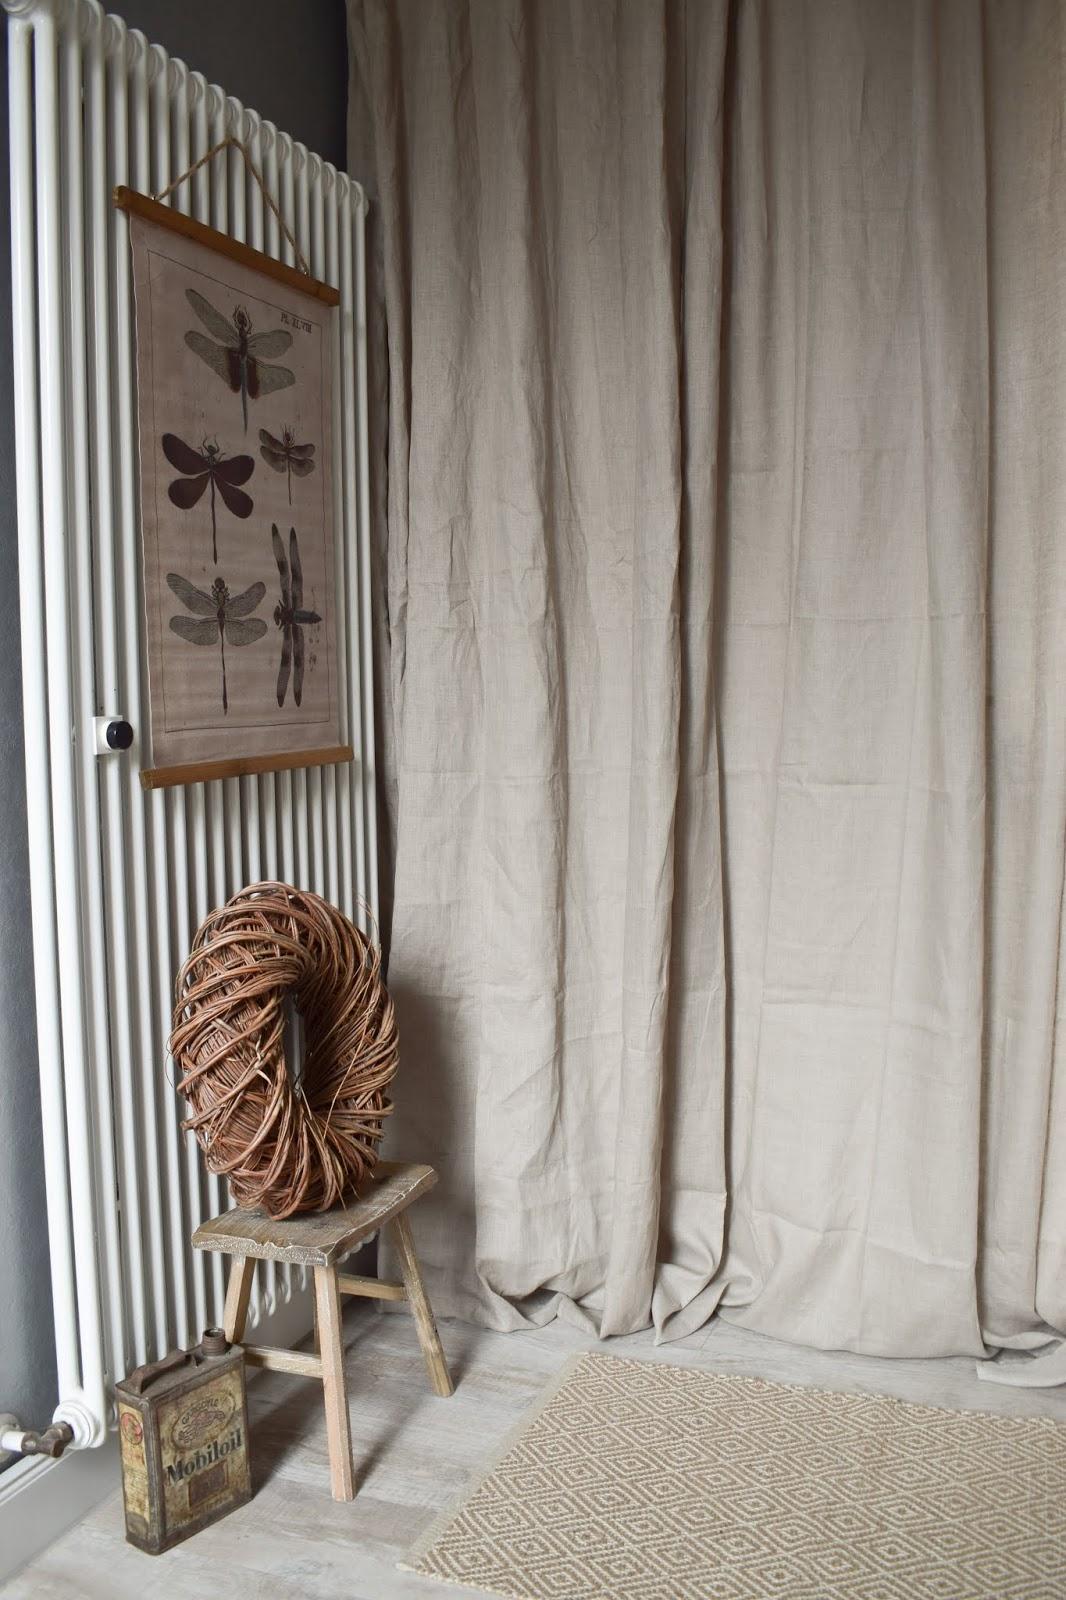 Dekoidee Leinwanddruck botanisch Heizkörper Verschönerung Kaschieren Deko dekorieren